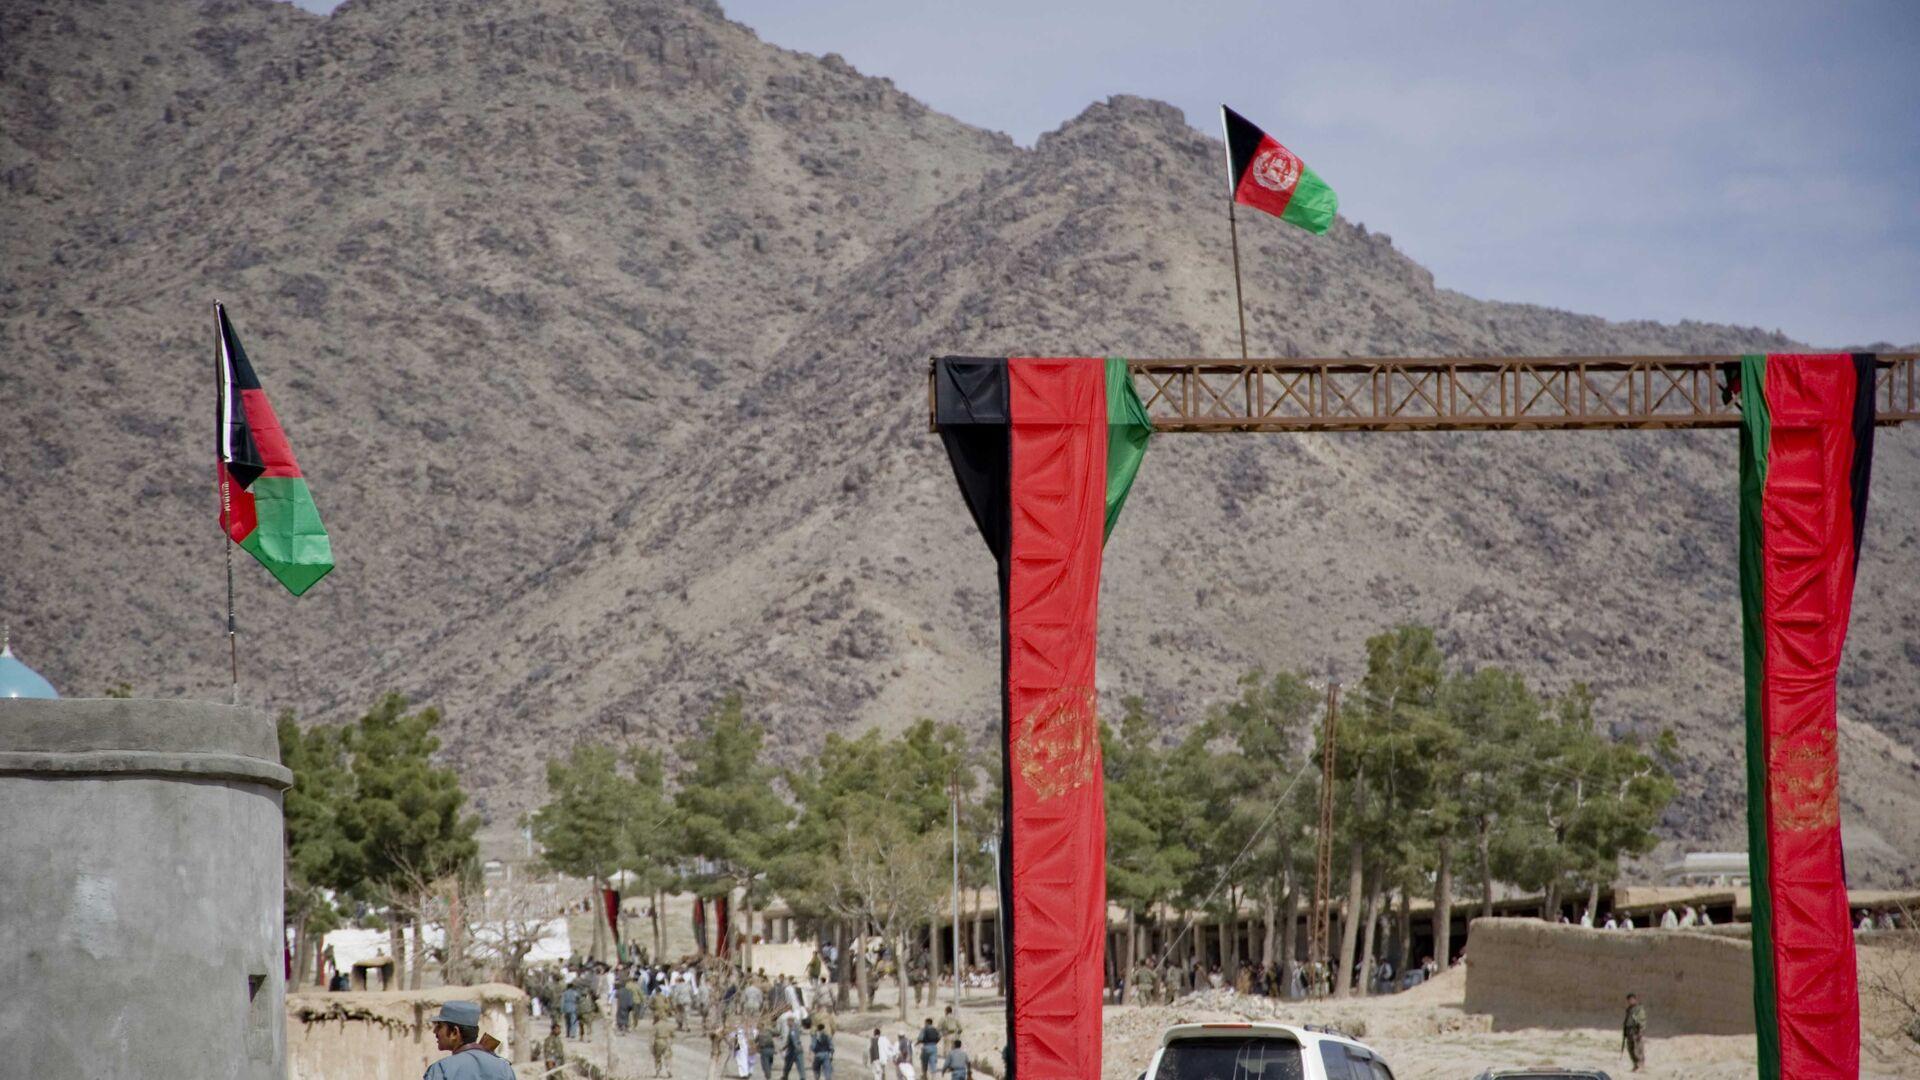 Bandera de Afganistán - Sputnik Mundo, 1920, 15.08.2021